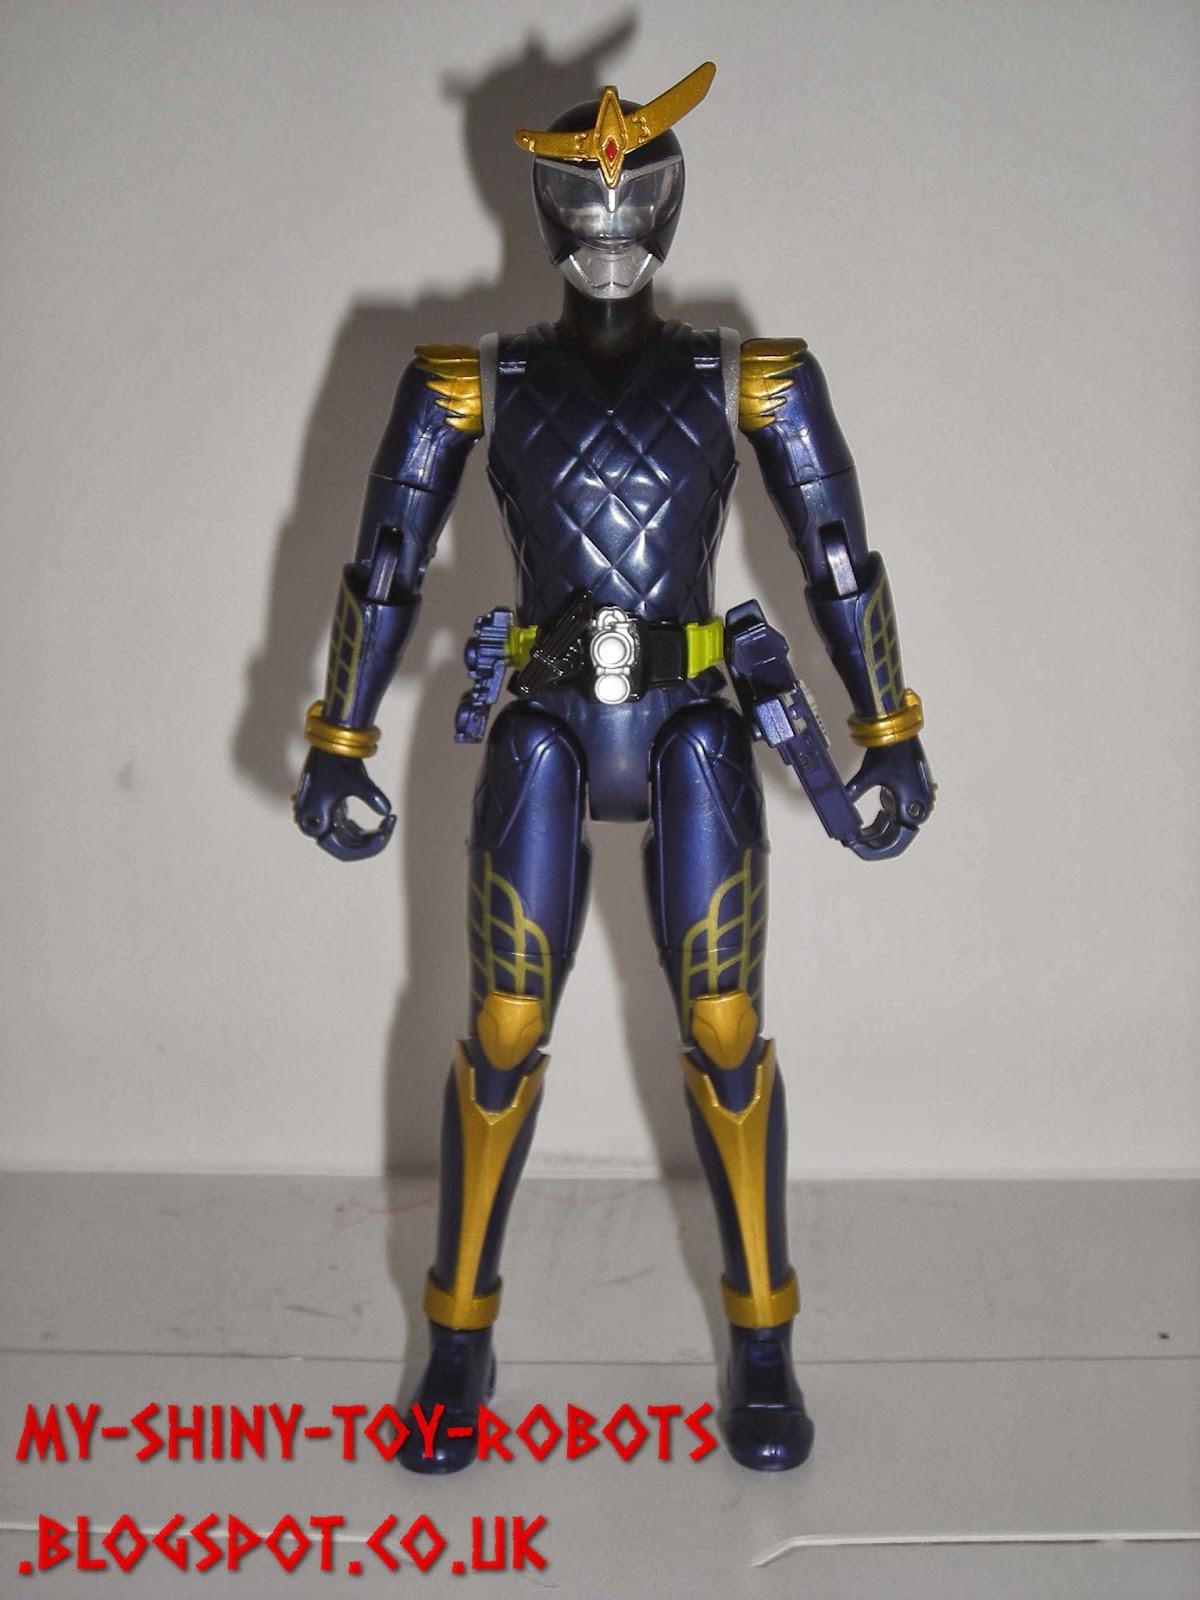 A rather naked looking Kamen Rider Gaim